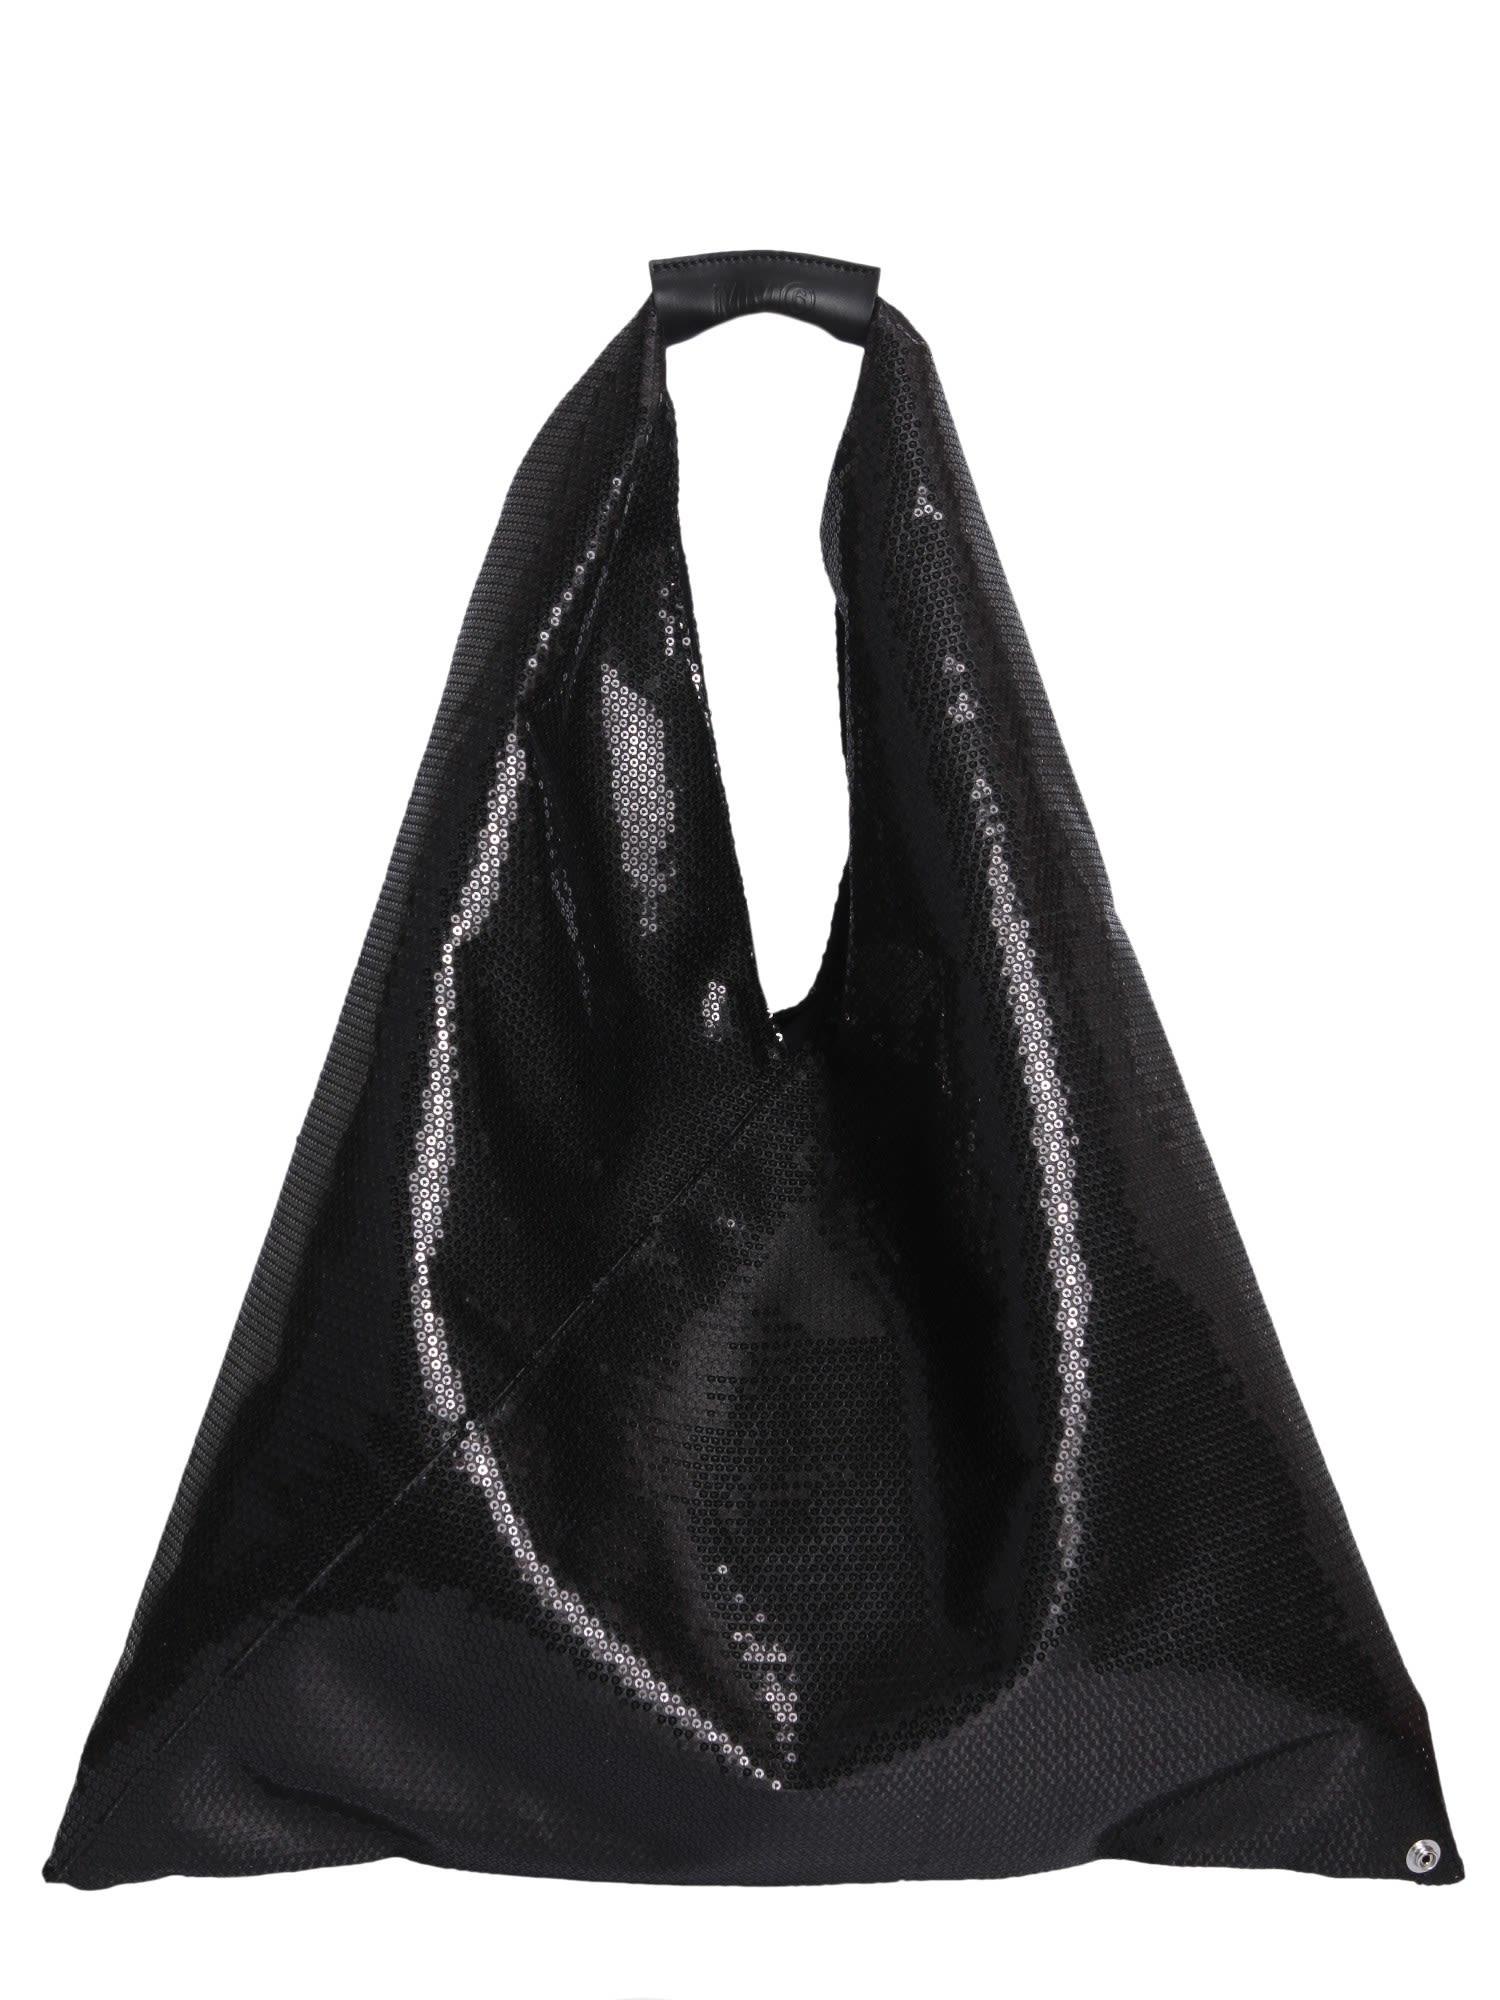 8d133f32588e MM6 Maison Margiela MM6 Maison Margiela Japanese Tote Bag - Black ...